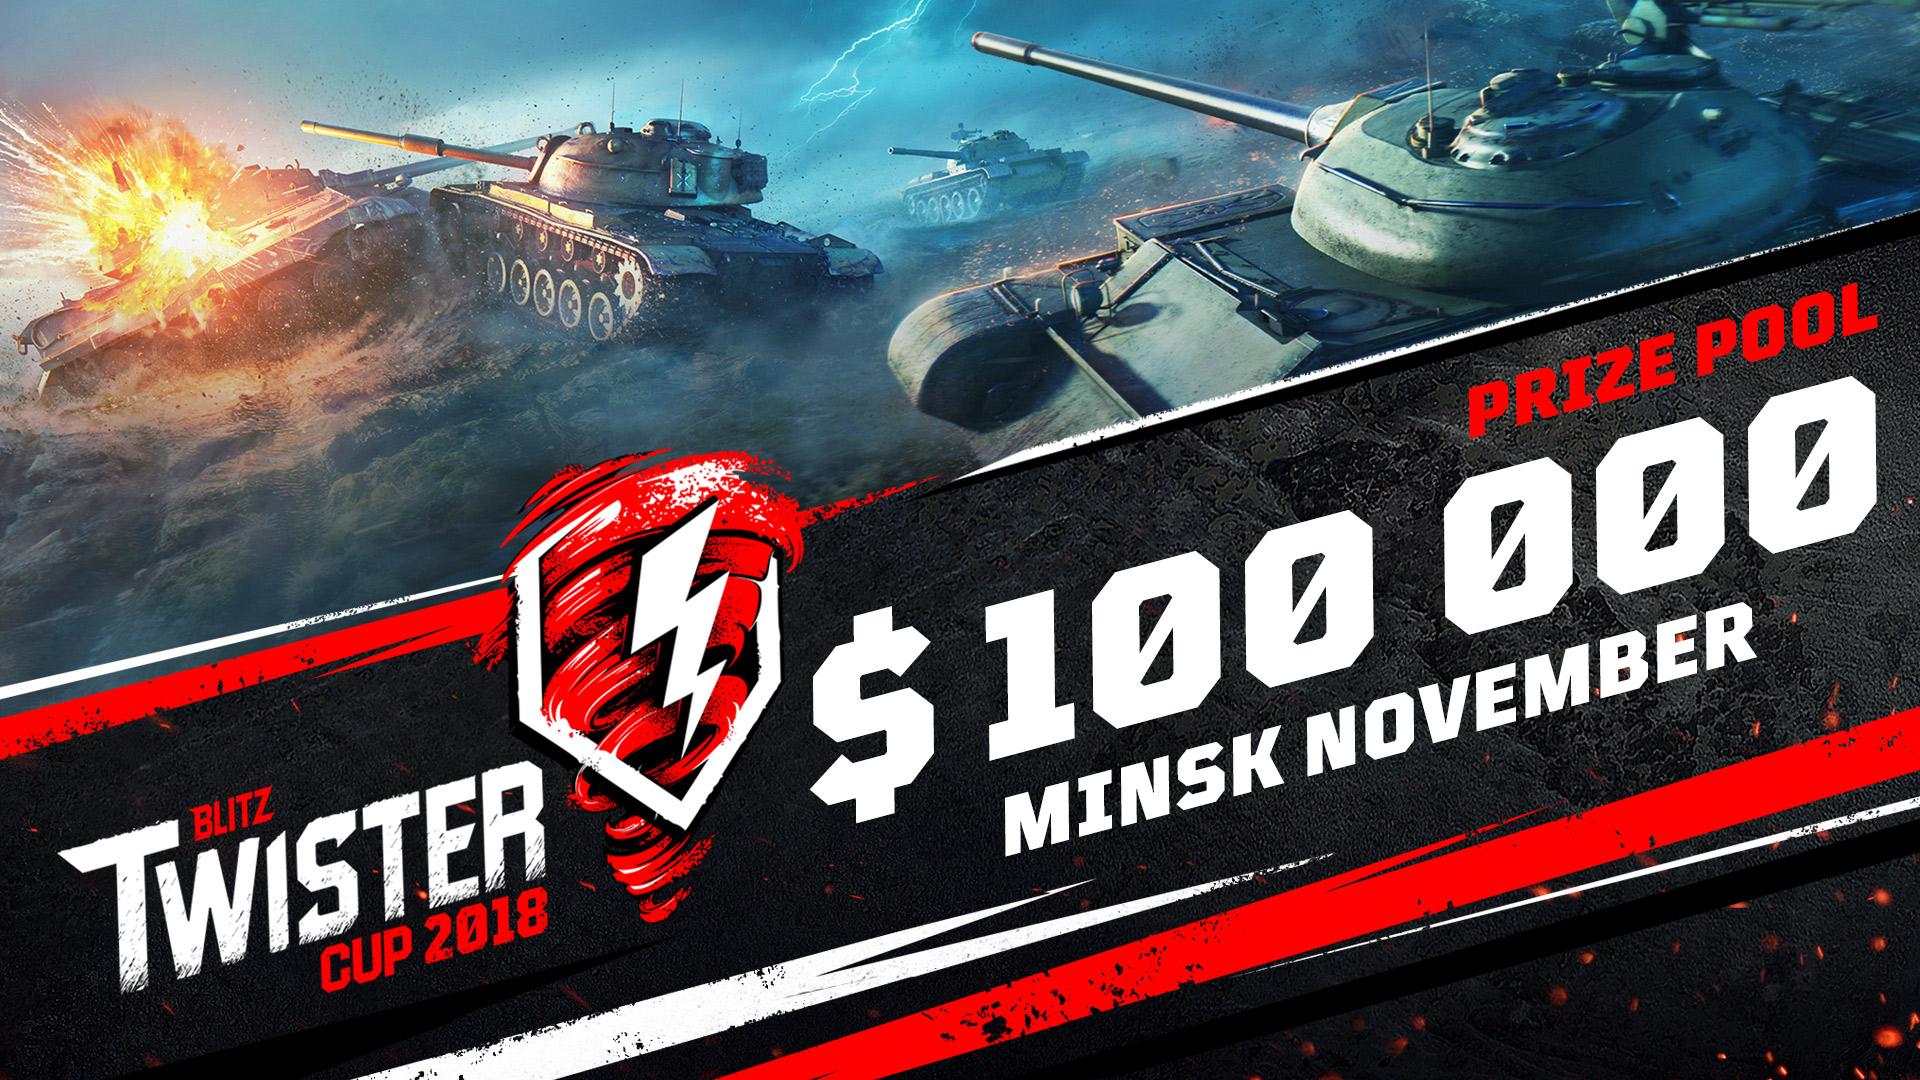 Blitz Twister Cup 2018 | World of Tanks Blitz